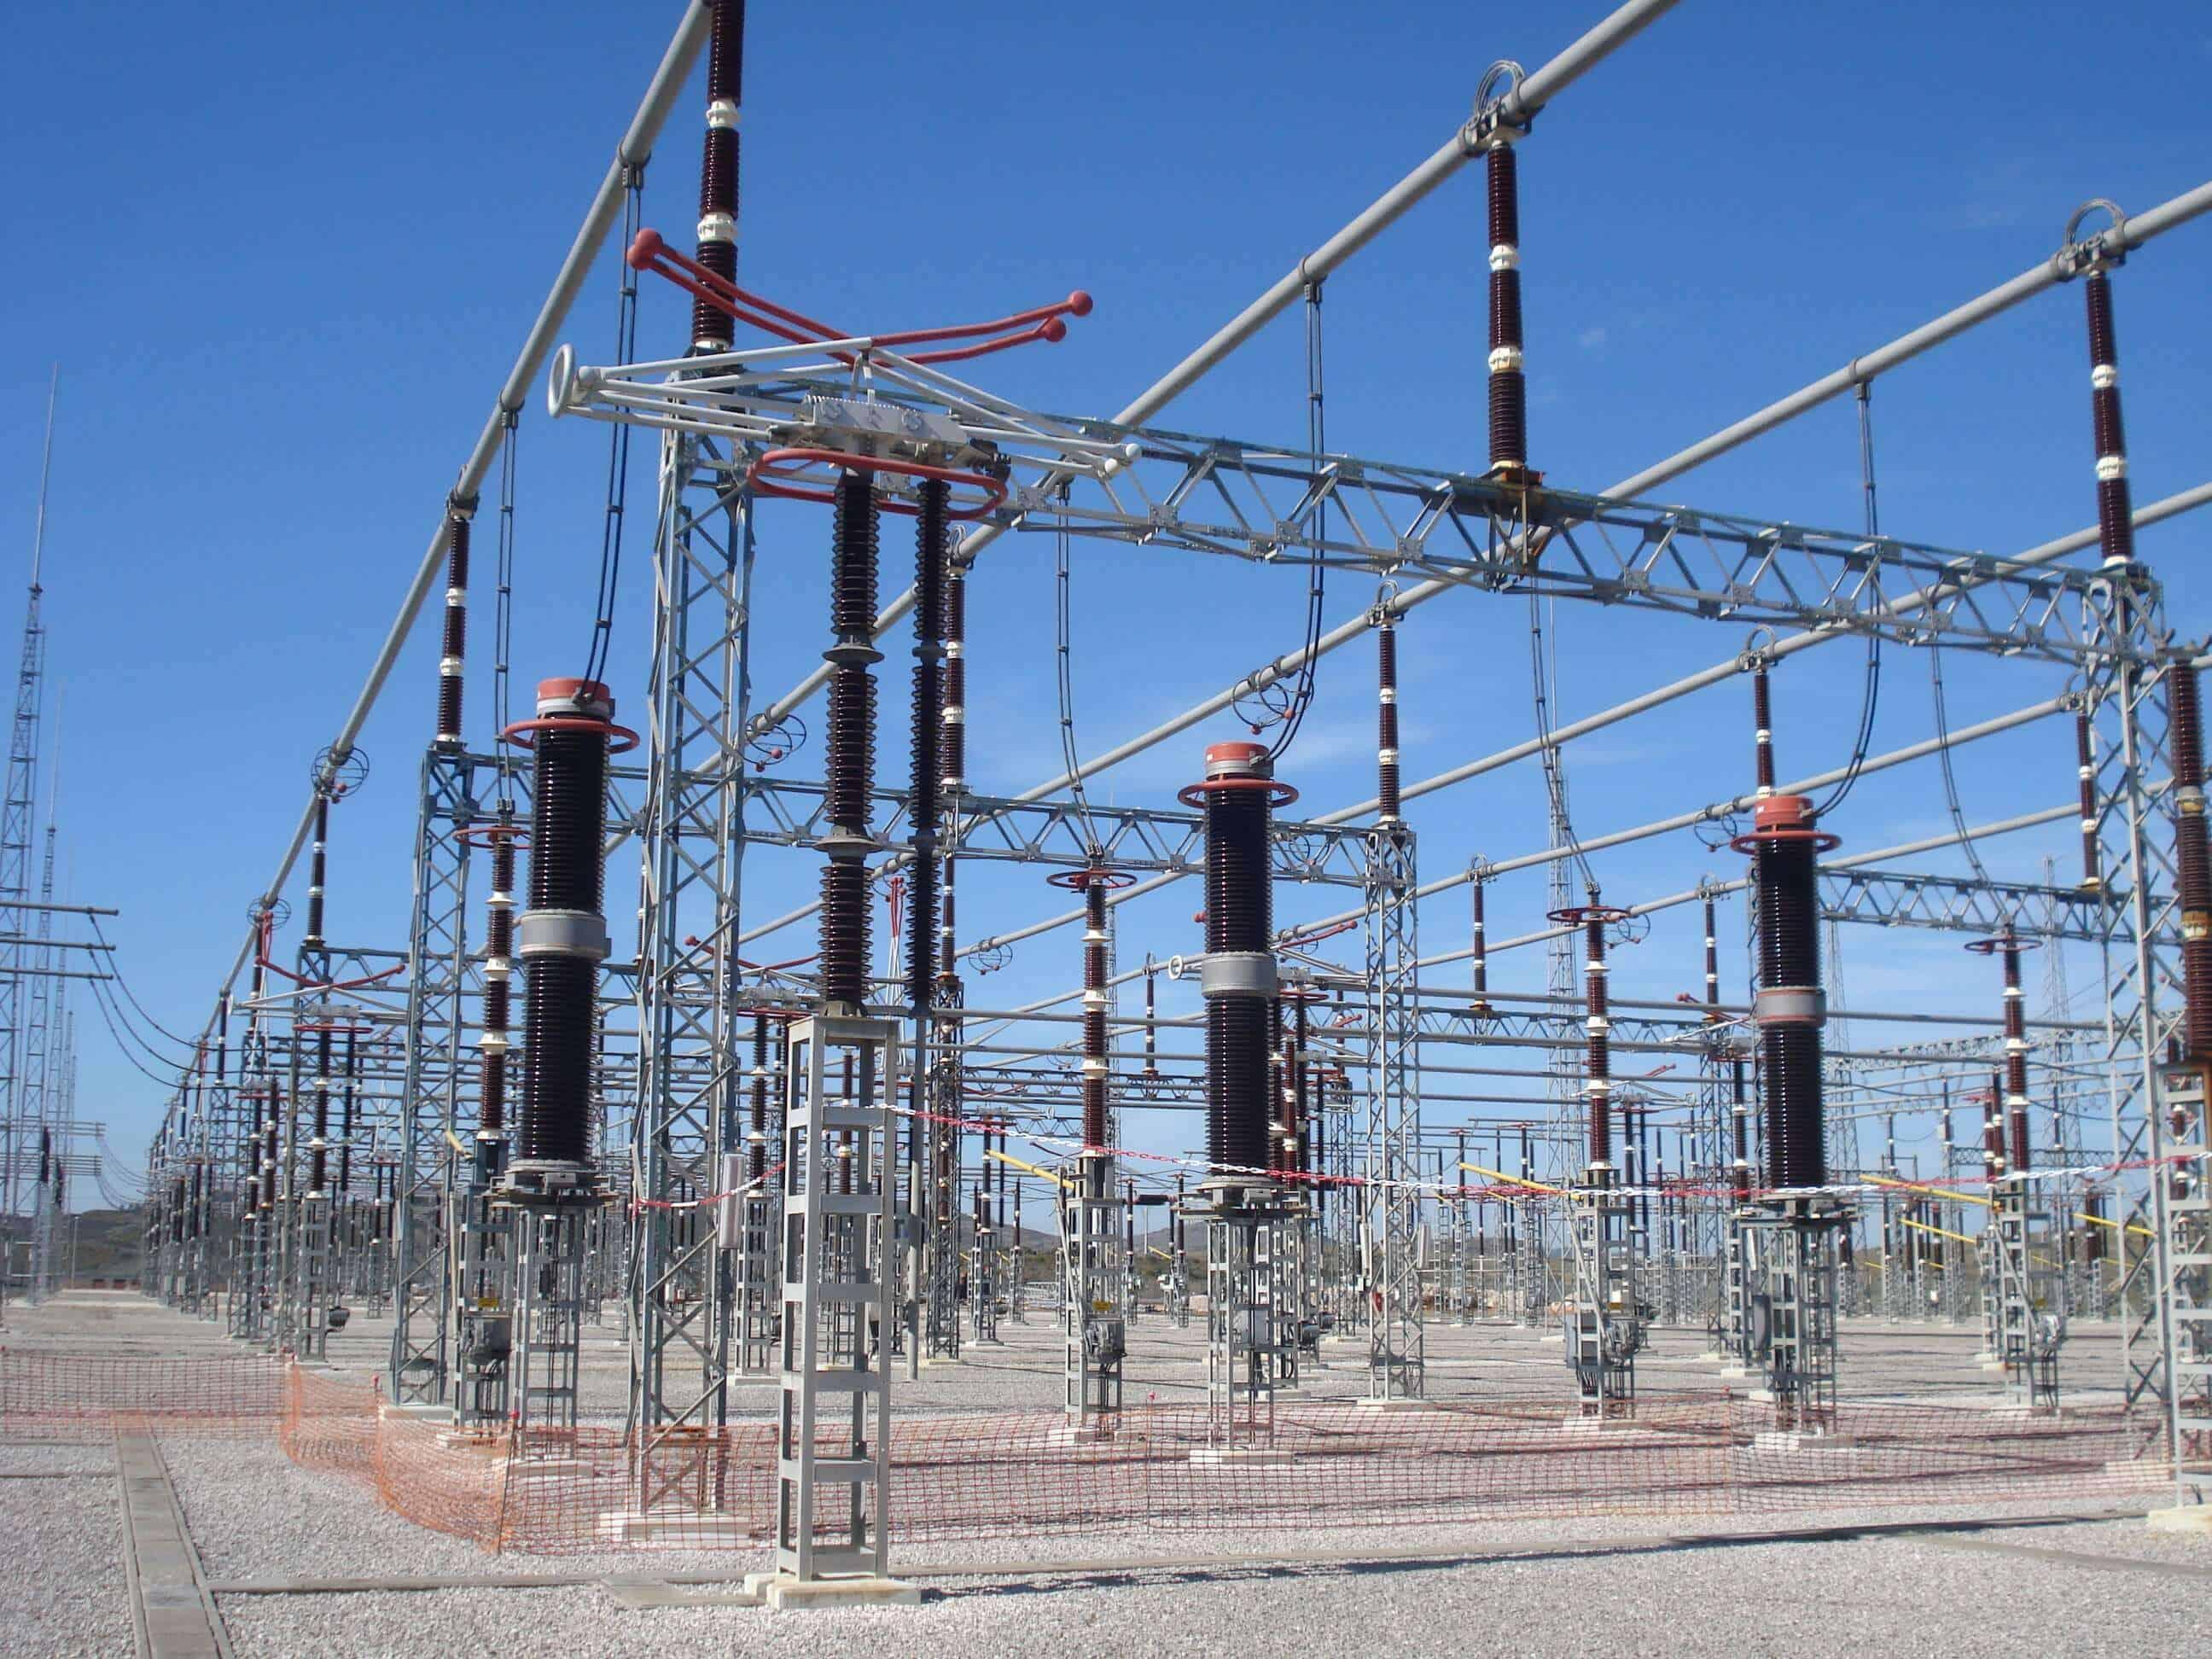 Design & Installation of EHV/EHV & EHV/HV Substations